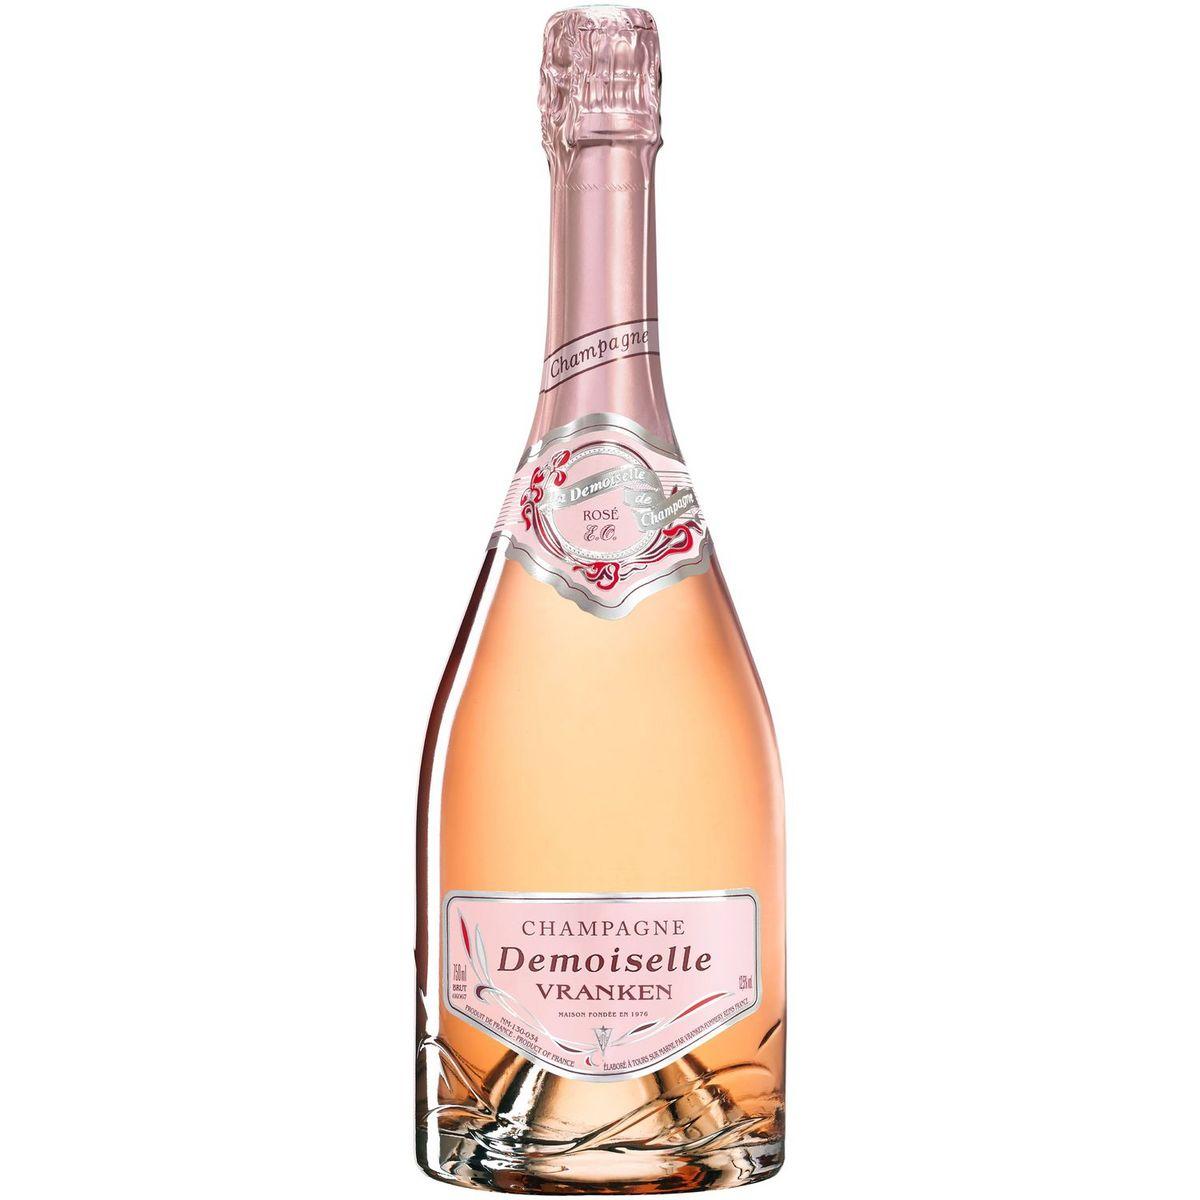 Vranken AOP Champagne Demoiselle rosé